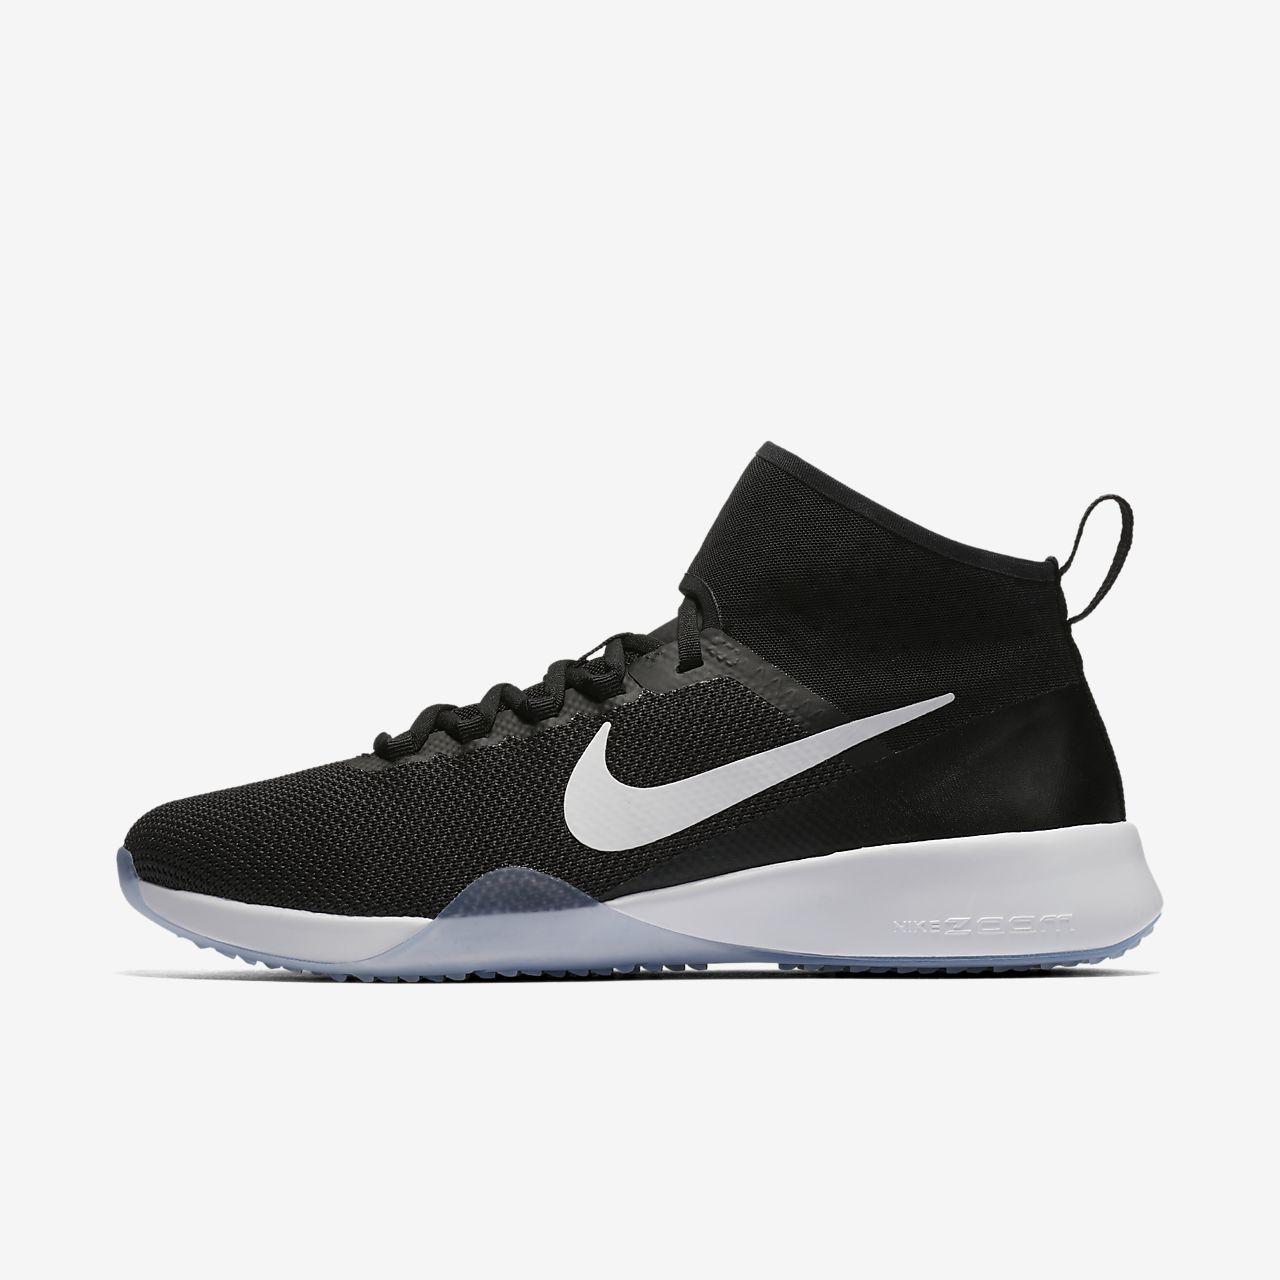 Bootcamp Für Workout Air Damen Nike 2 Strong Schuh Zoom SLjzMGqUVp